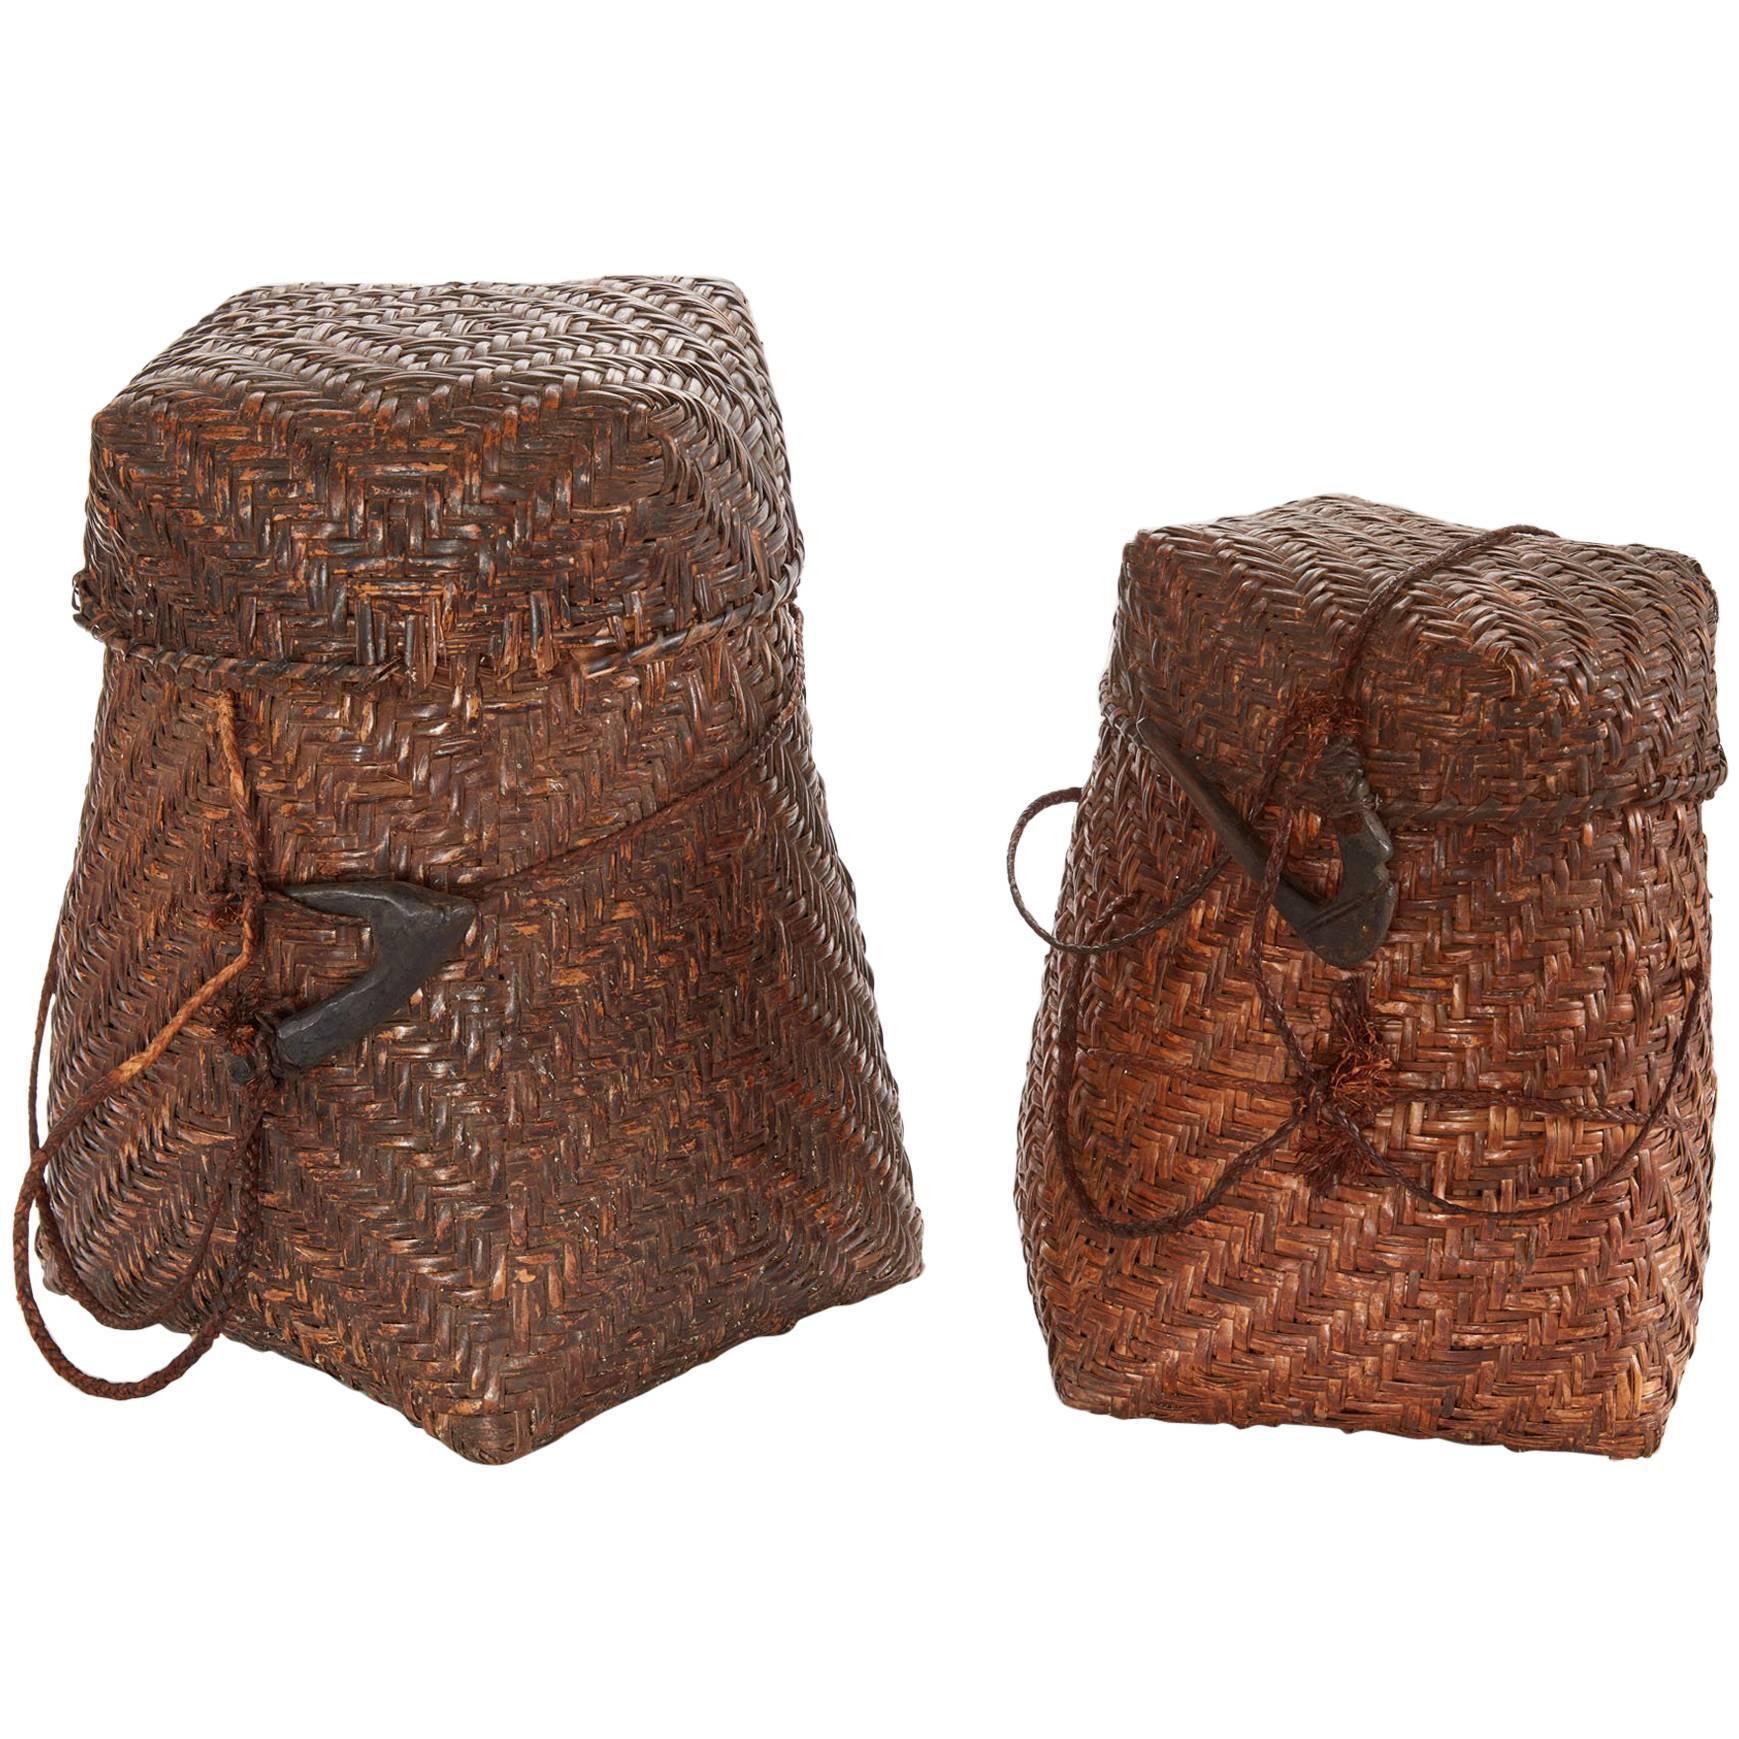 Pair Of 20th Century Woven Nigerian Baskets